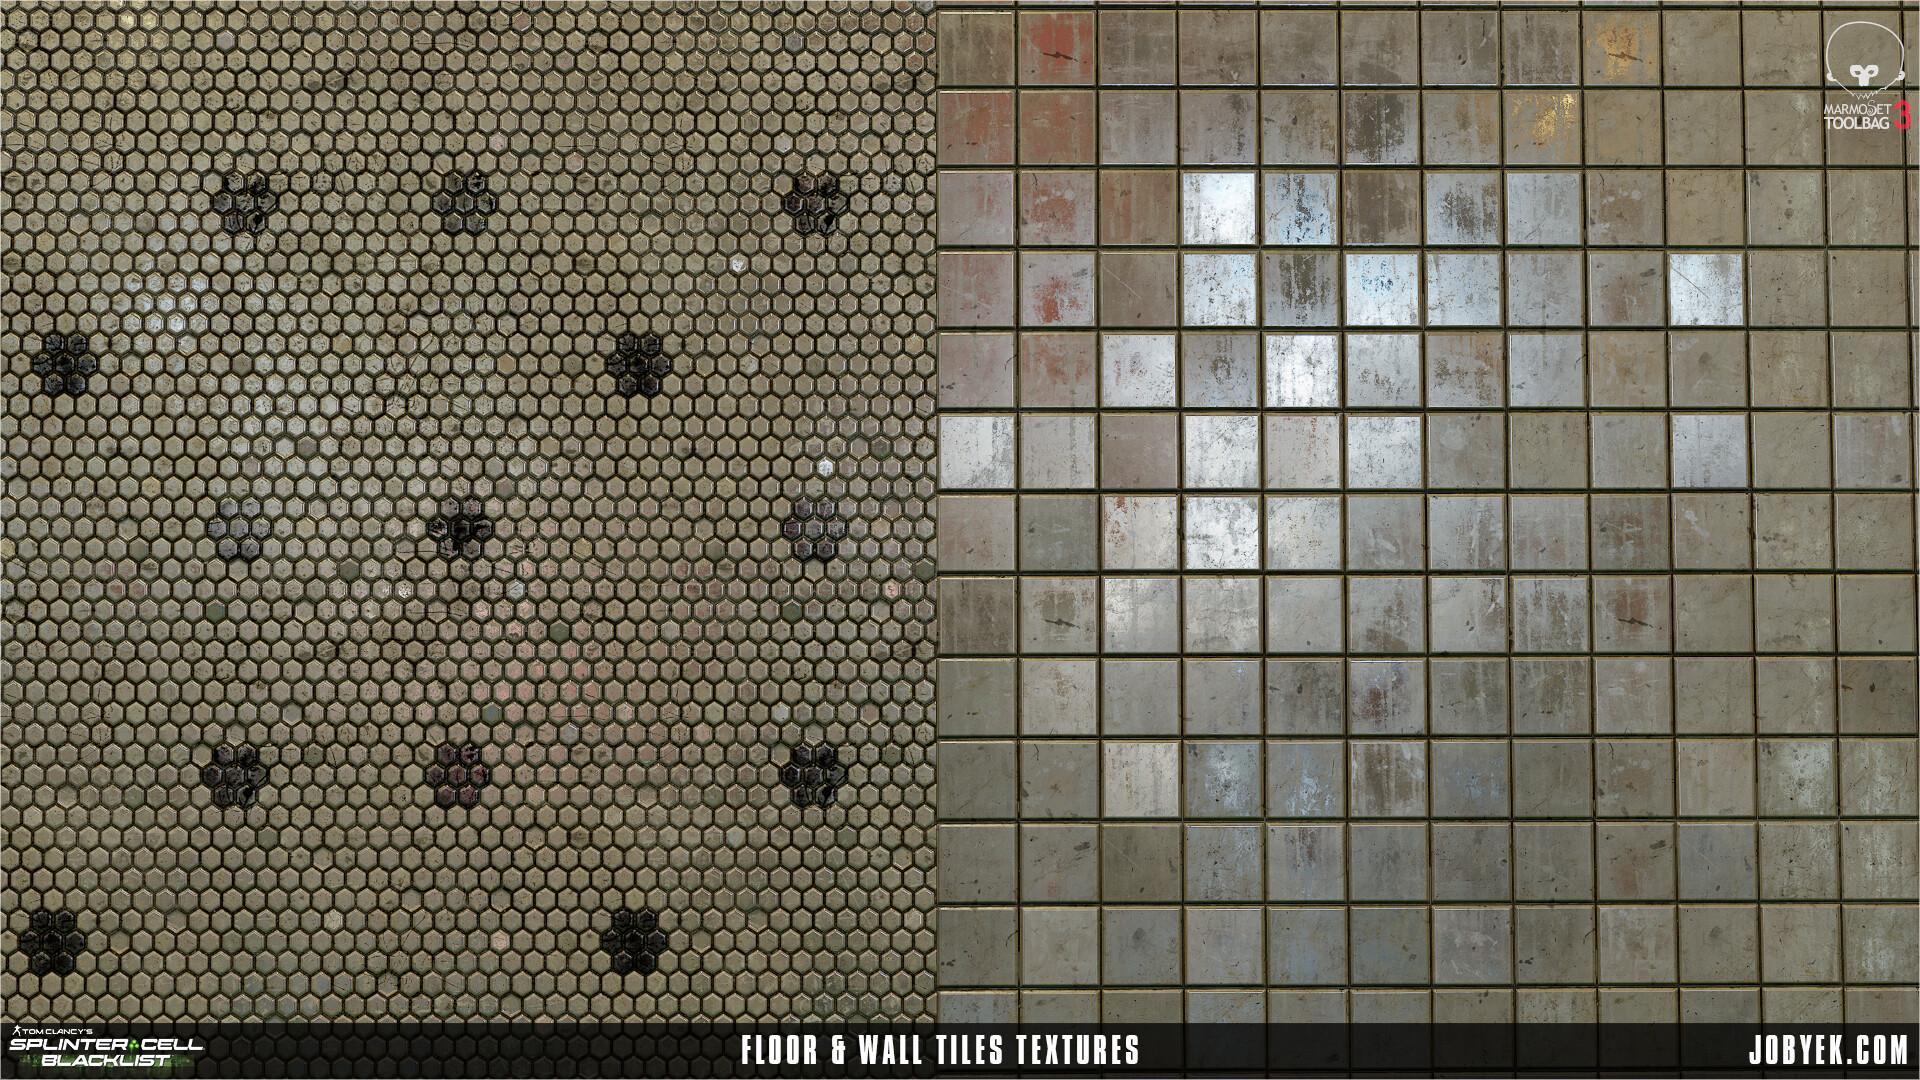 Jobye kyle karmaker scb texture walls 01